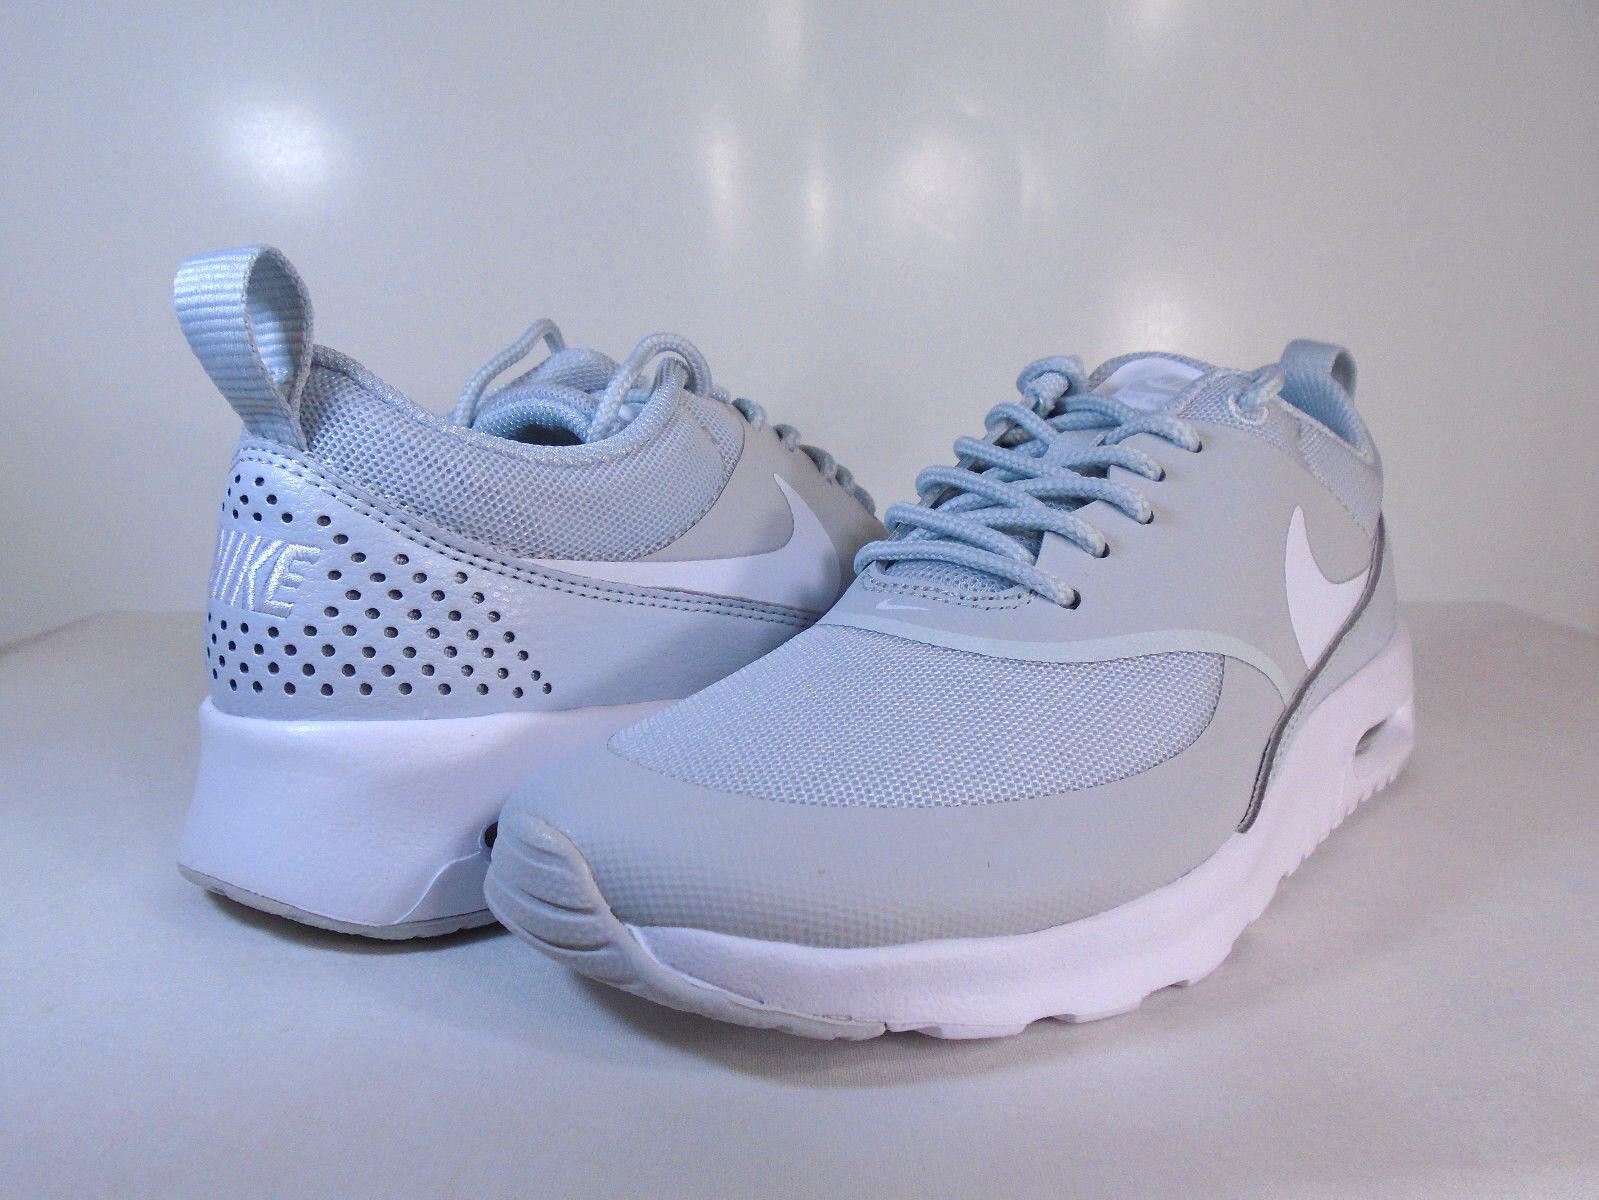 NIKE WMNS AIR MAX THEA Pure Platinum White -599409 019- ATHLETIC